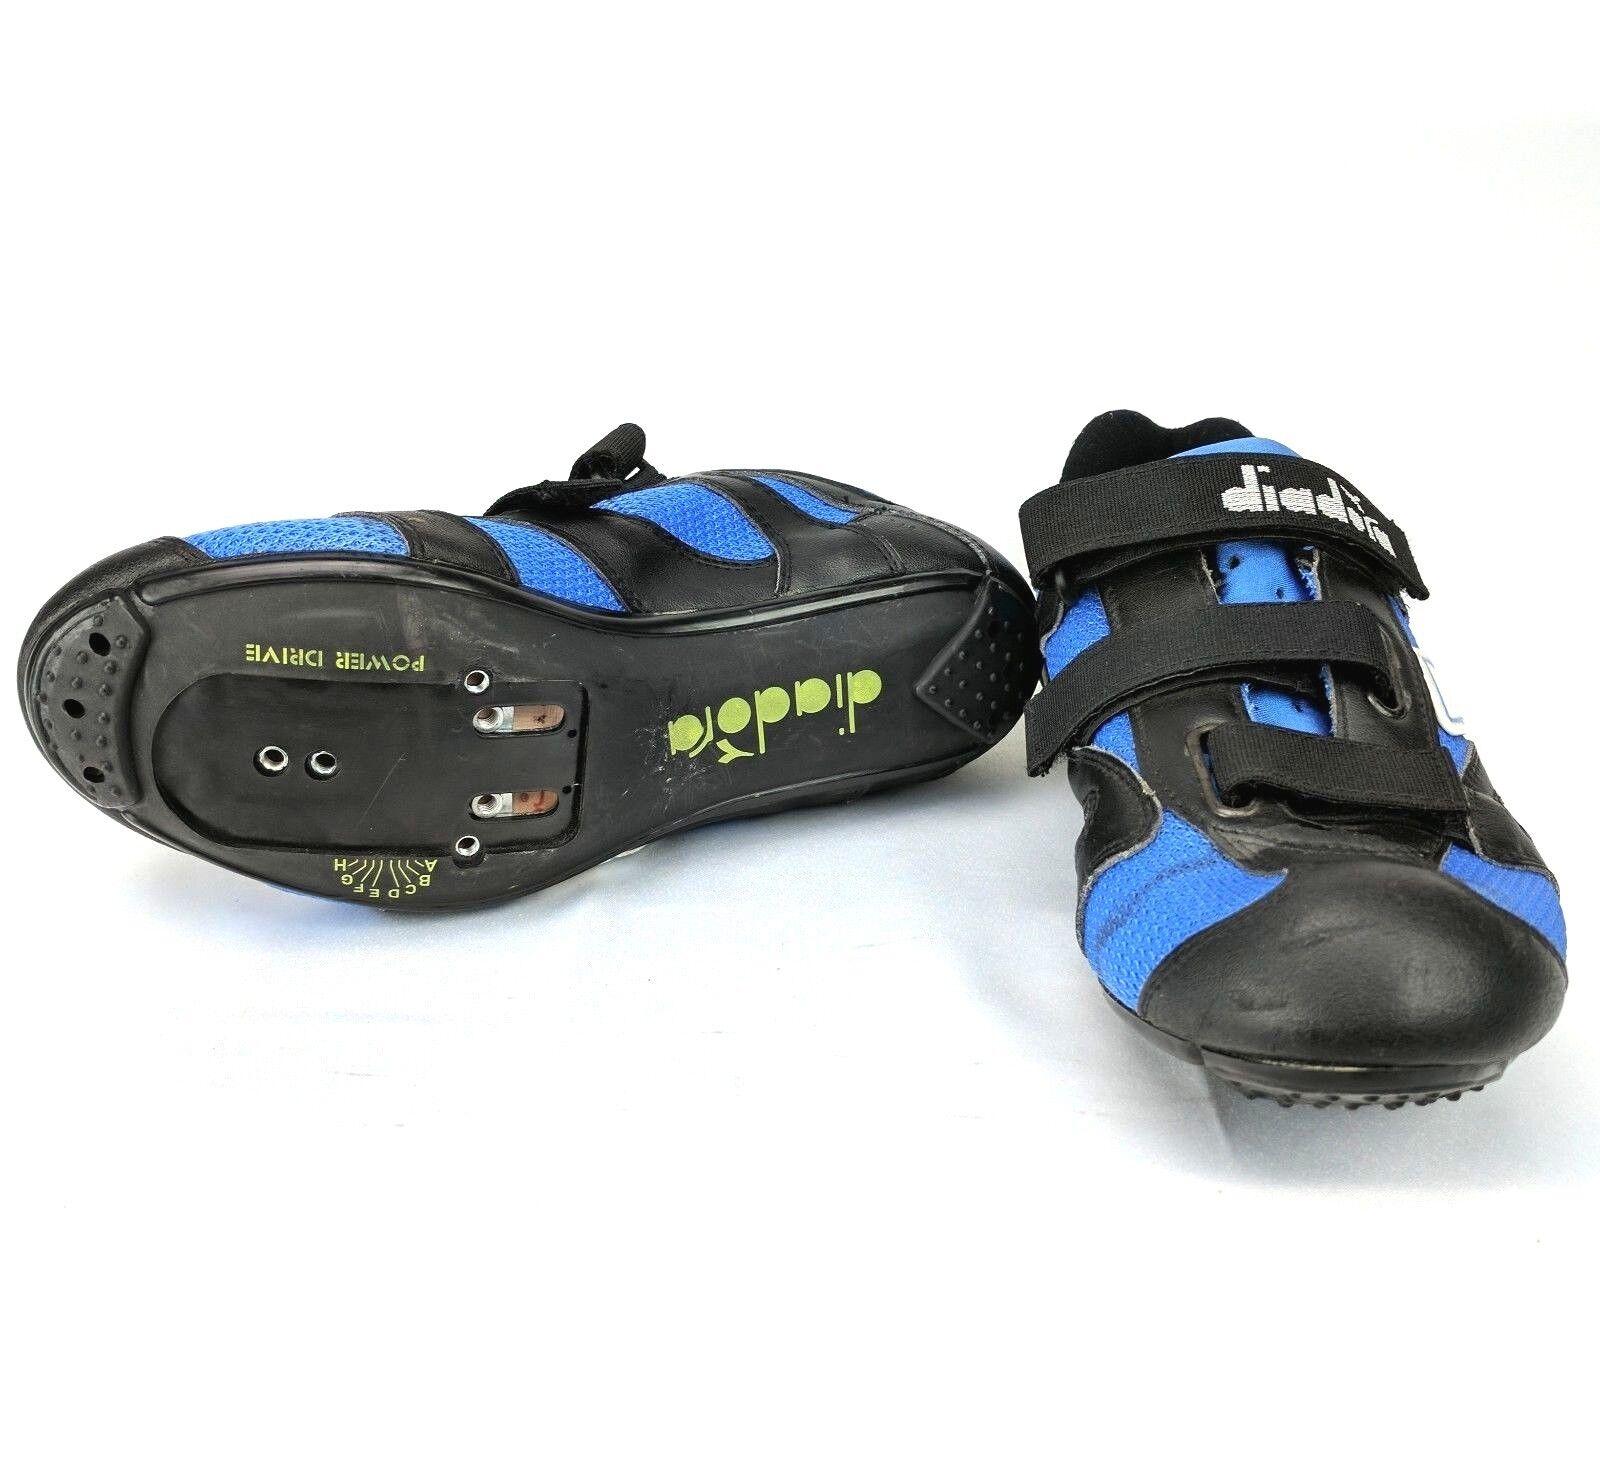 Unidad de alimentación  de colección Diadora Azul Ciclismo Zapatos Talla EU 38.5 para Mujer Hombre usado en excelente estado  Ven a elegir tu propio estilo deportivo.